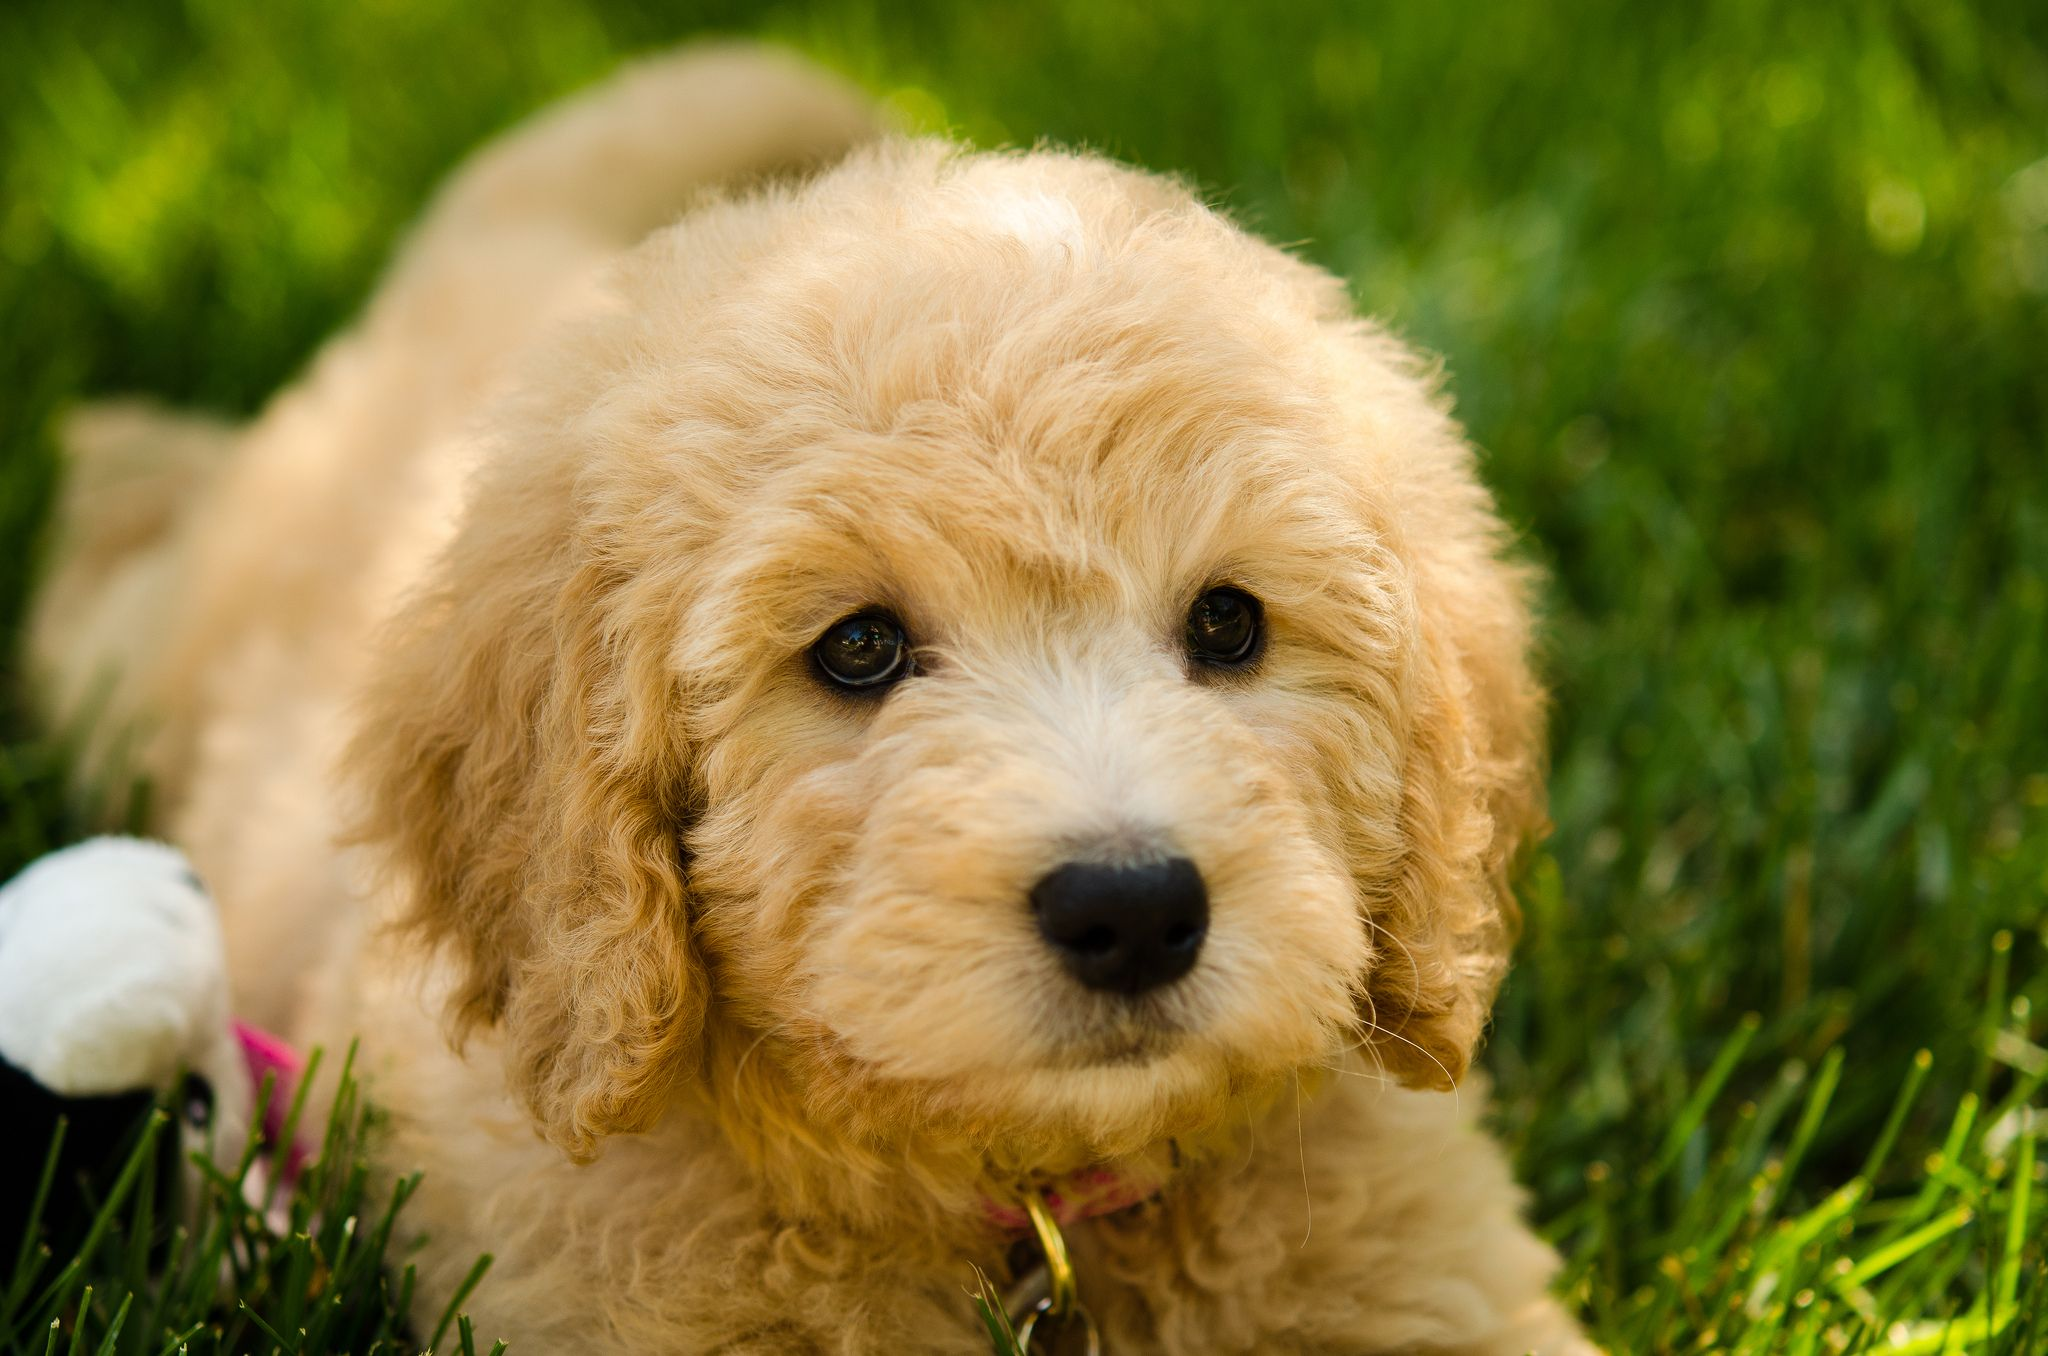 Golden Doodle Dapple Dachshund Golden Retriever Poodle Mix Puppies